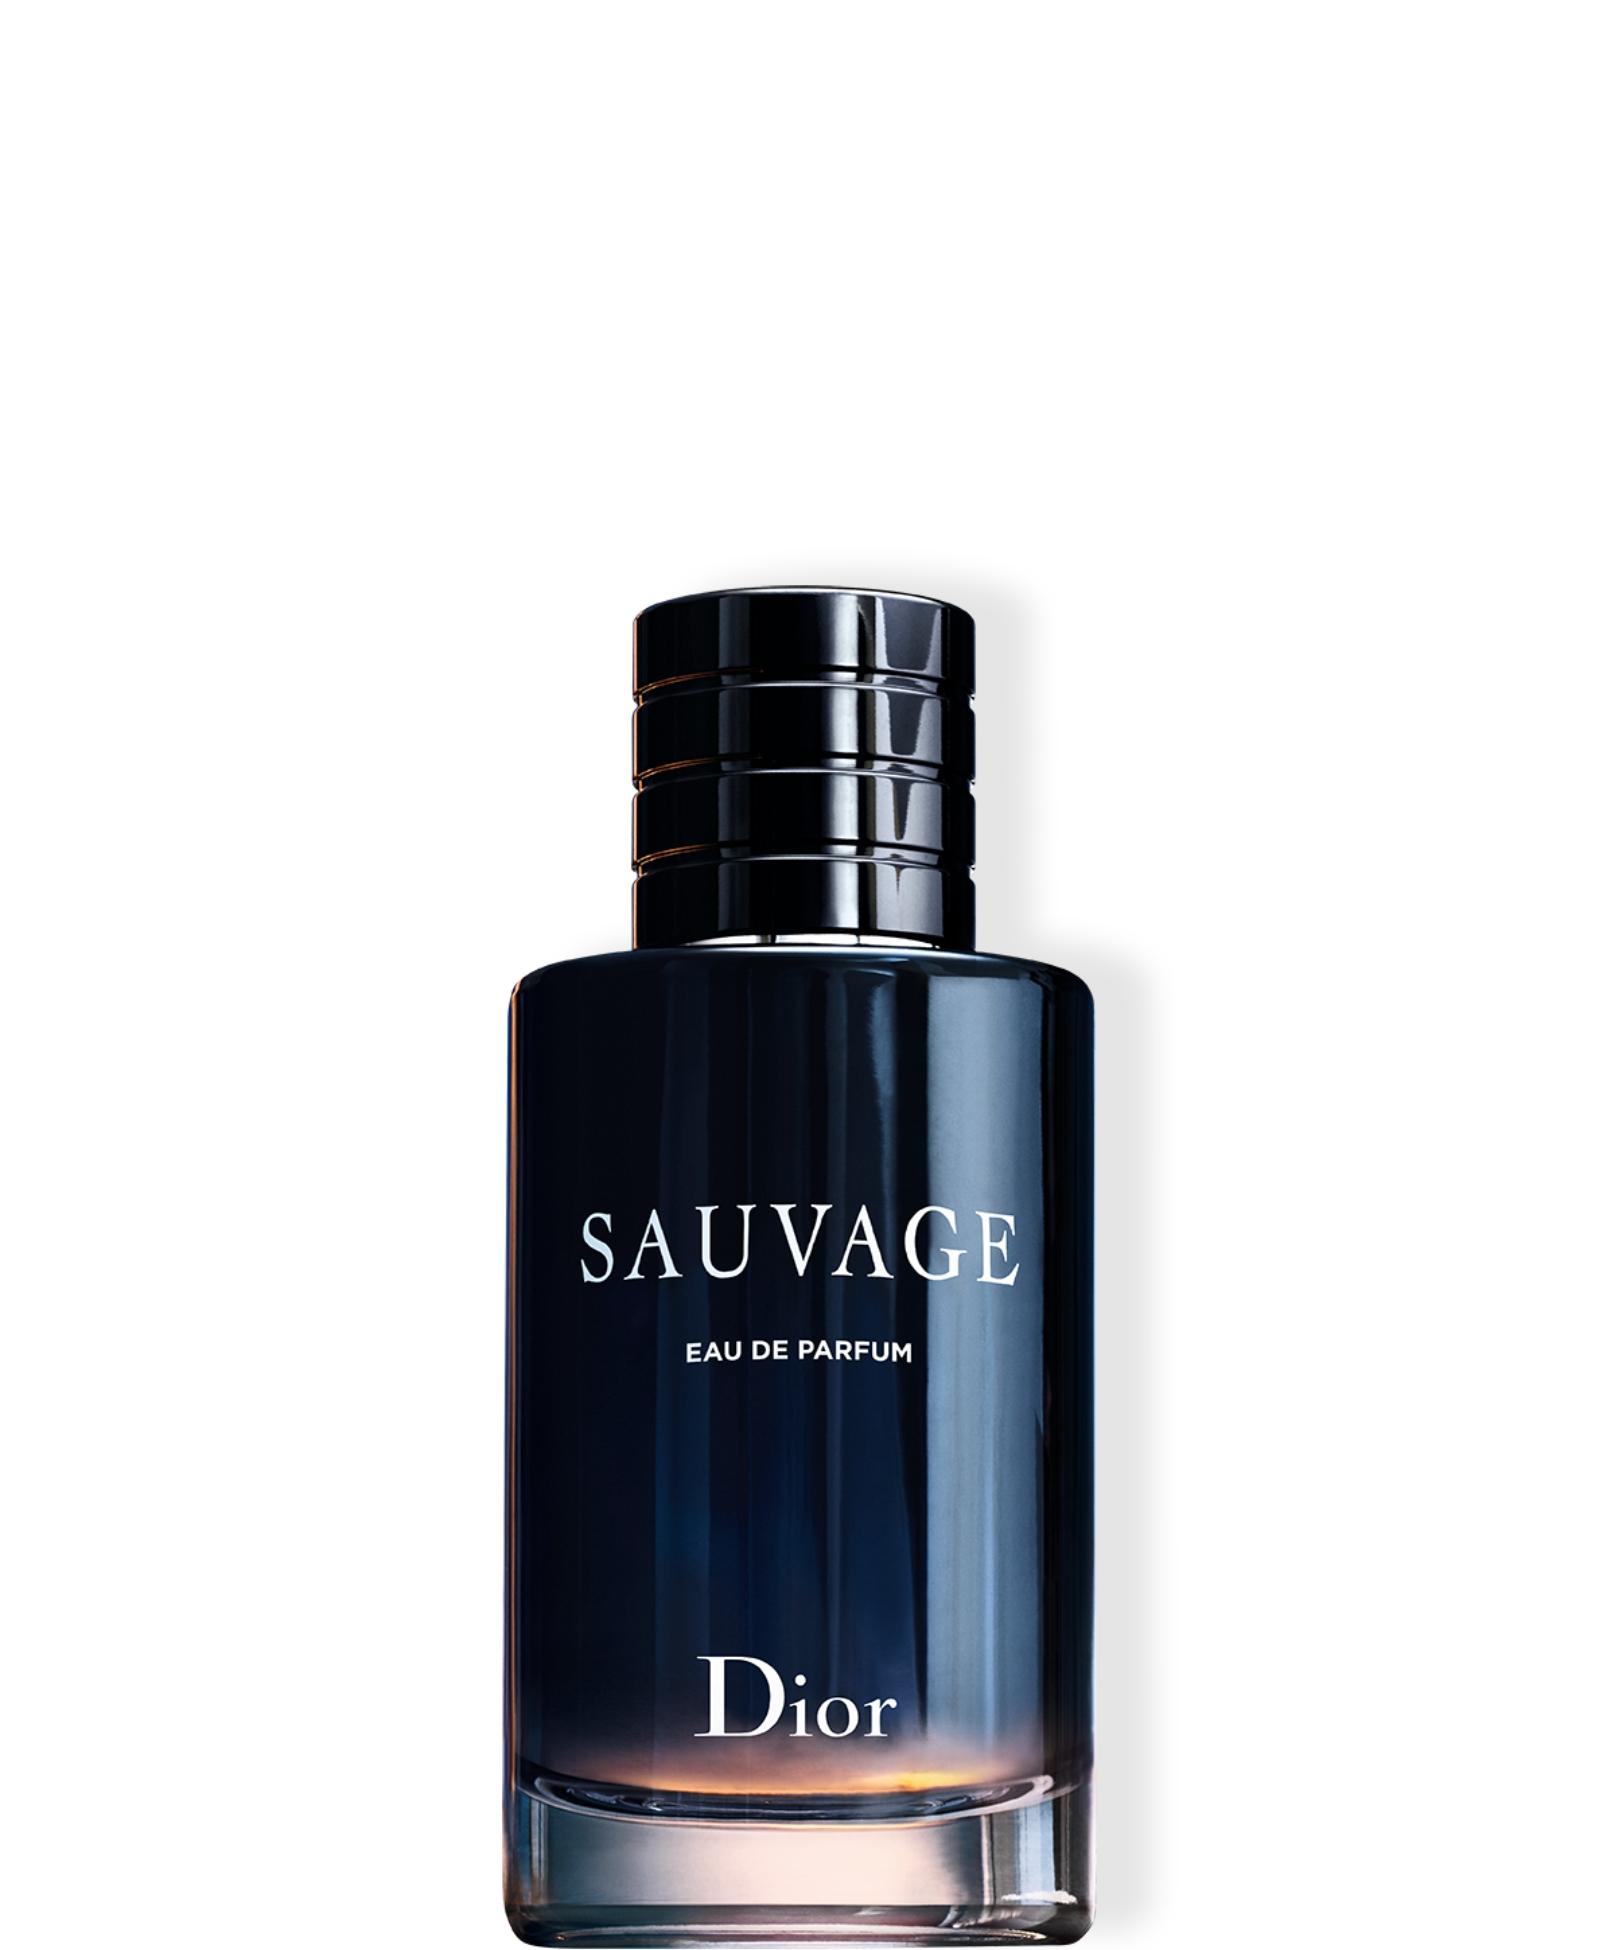 DIOR Sauvage Eau de Parfum, 60 ml